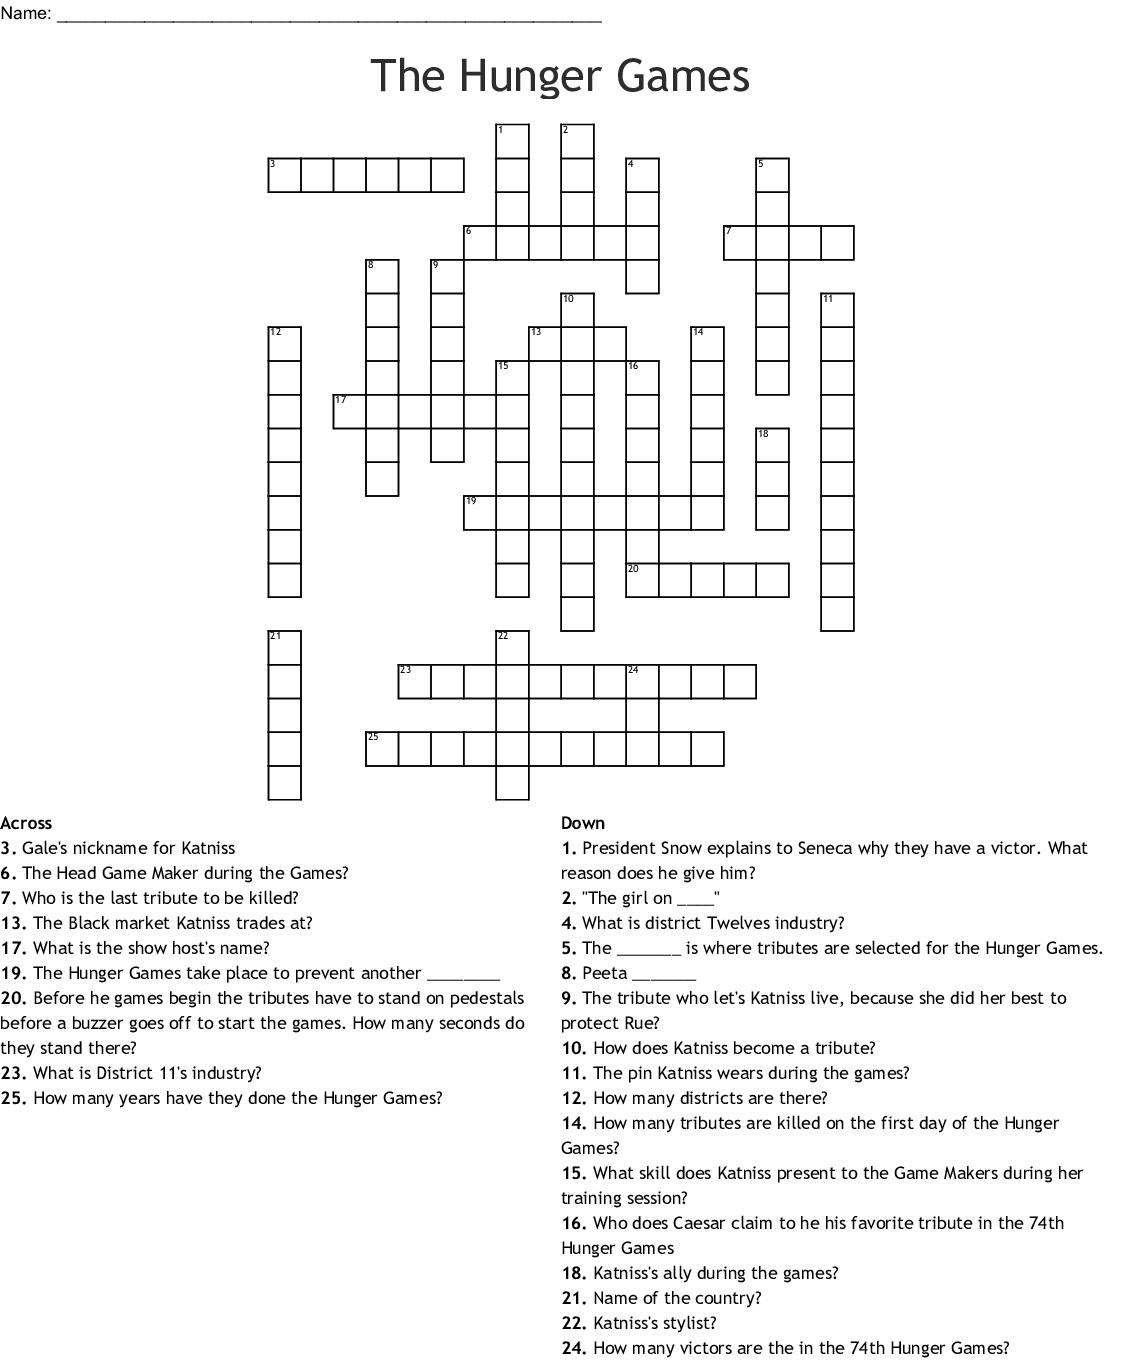 The Hunger Games Crossword